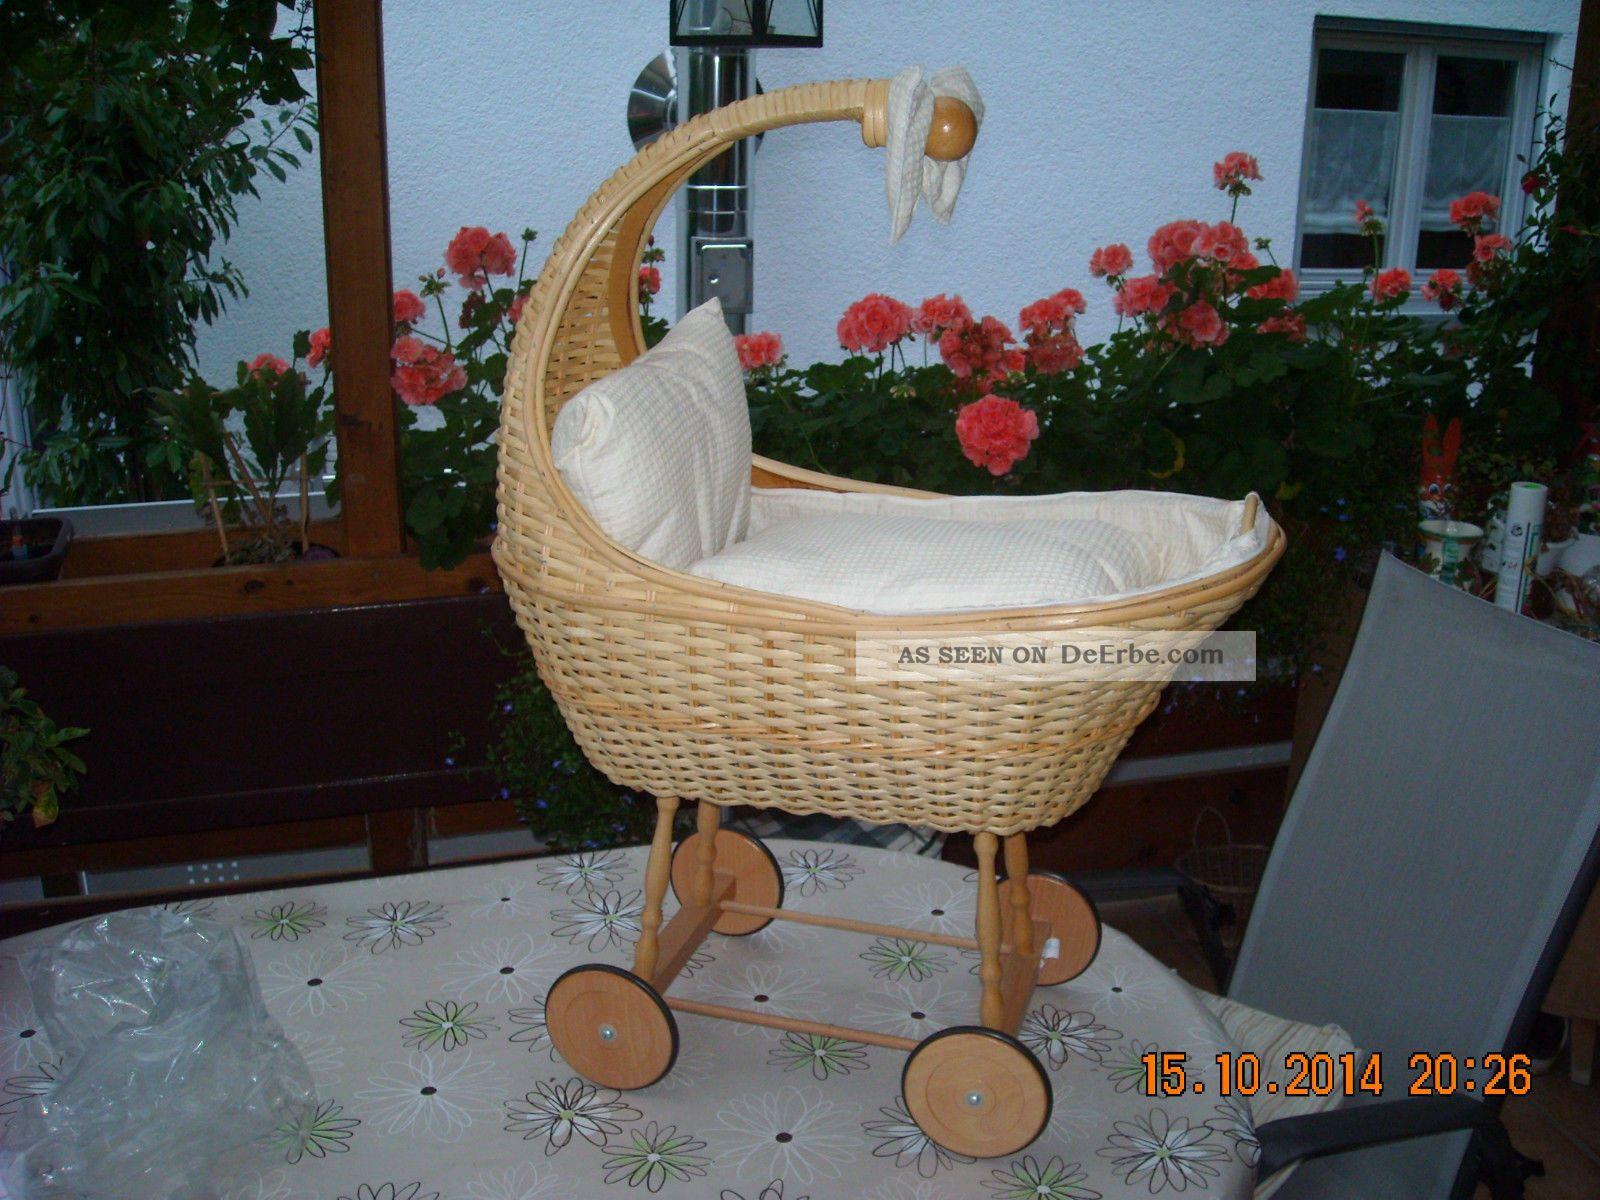 Babywiege antik küche nürnberg frische haus ideen